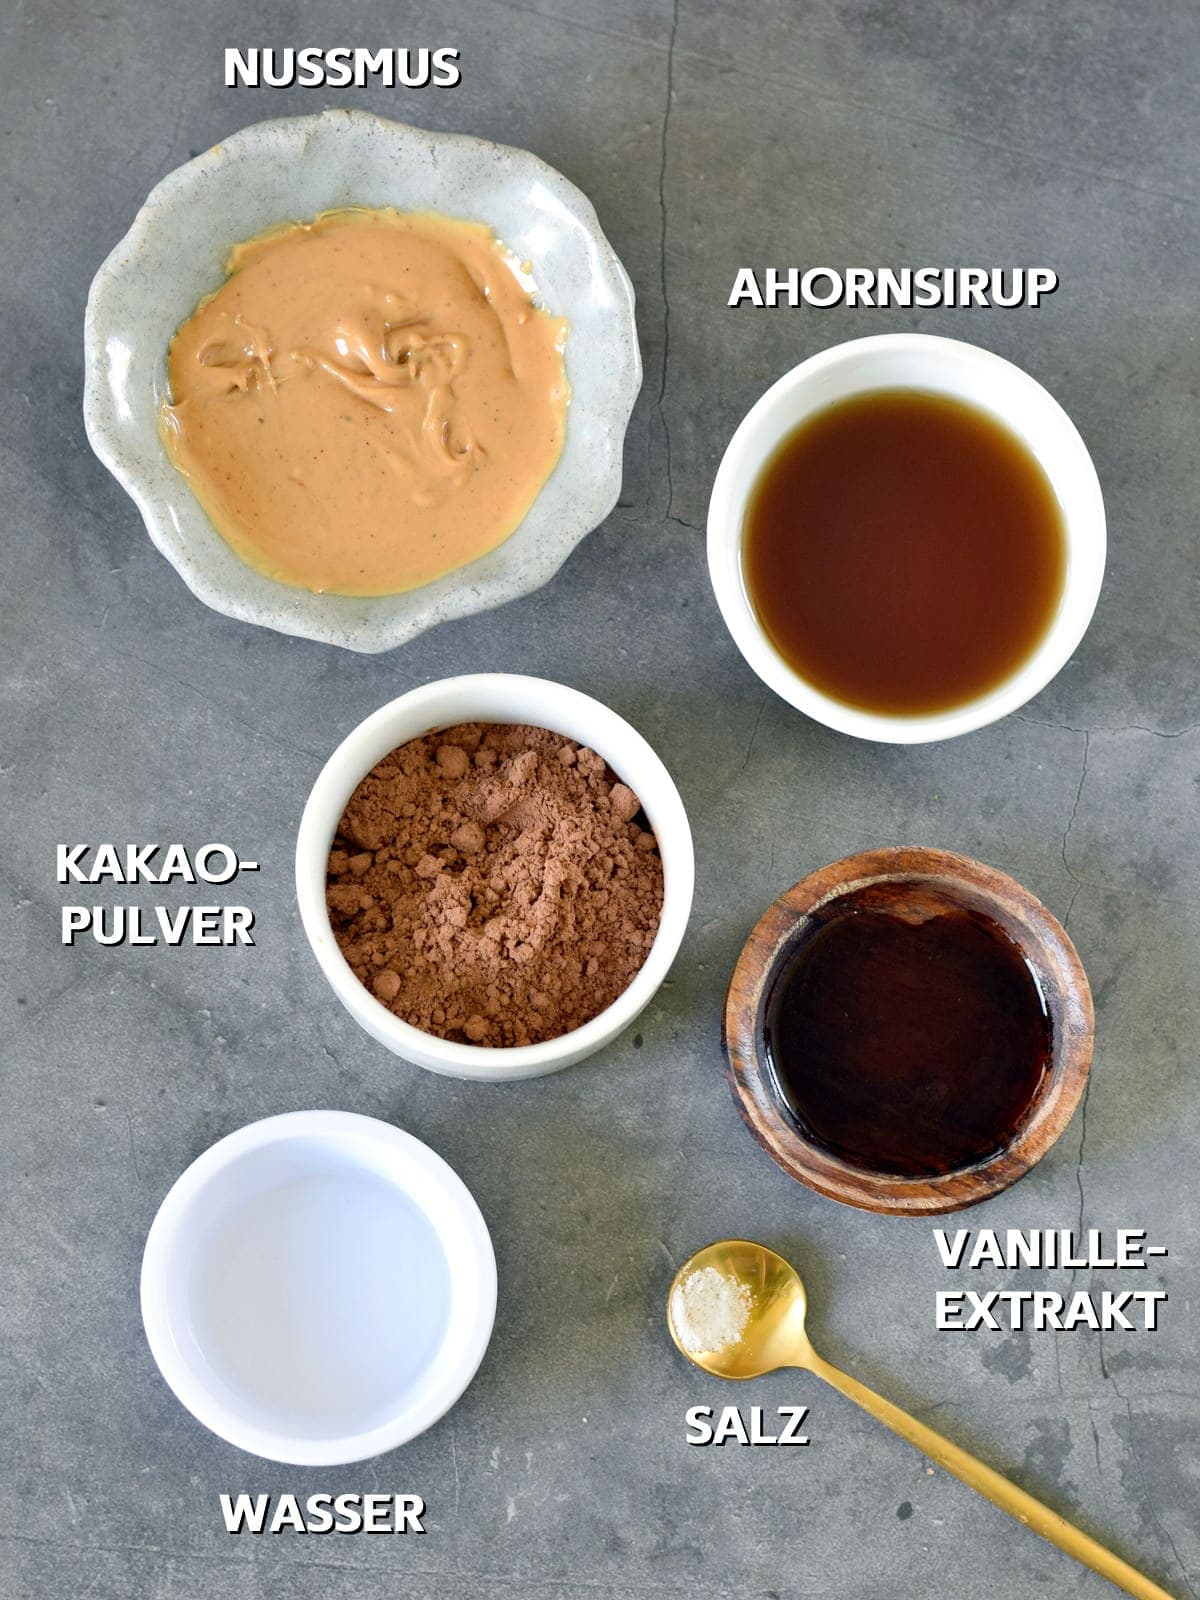 Ahornsirup, Nussmus, Kakaopulver, Wasser, Vanilleextrakt, Salz